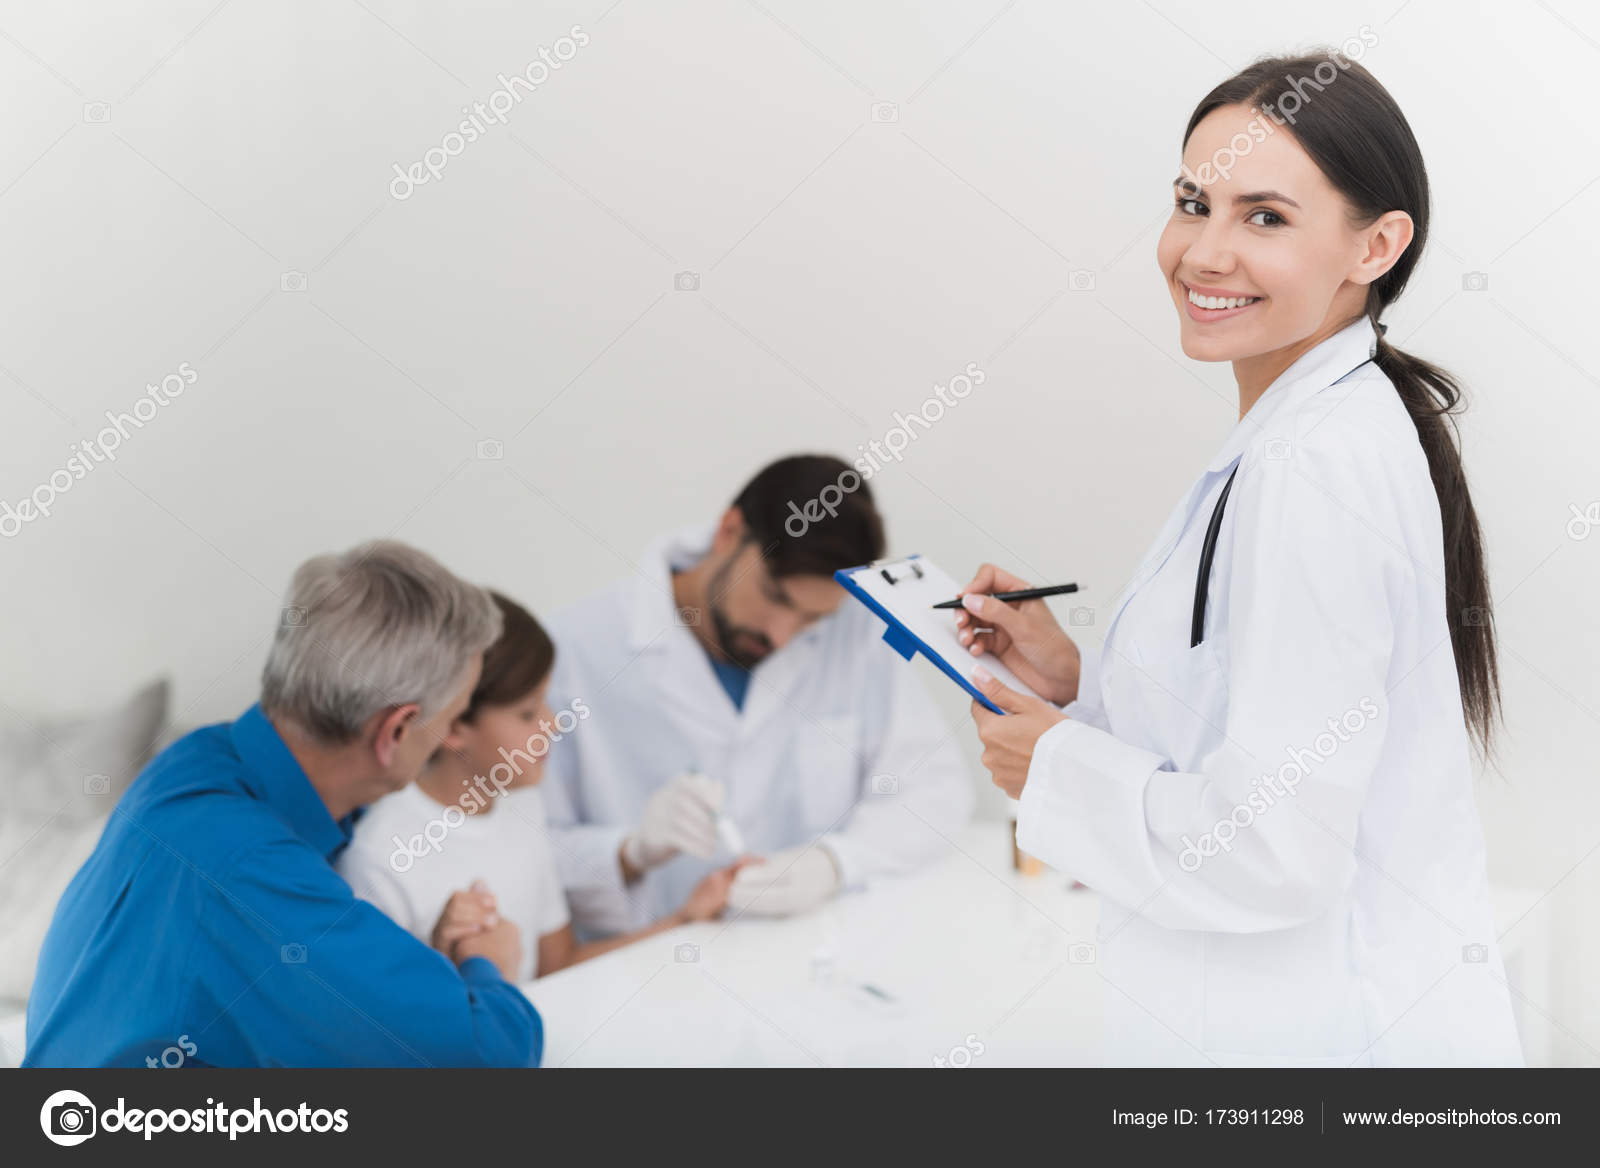 Дедушка и молодая медсестра